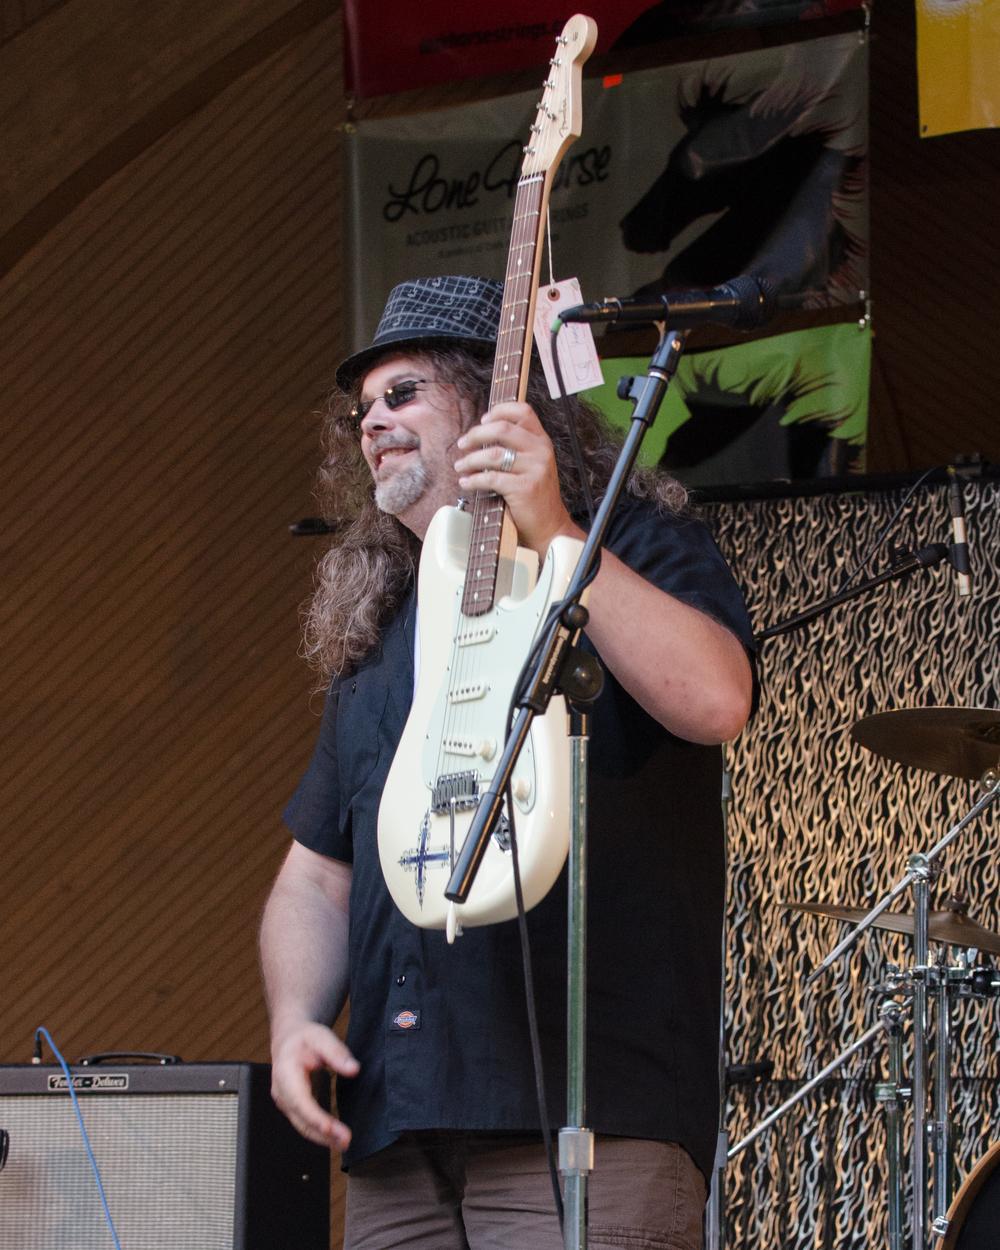 Fleetwood_Blues_Festival_2013-08-11_-454.jpg